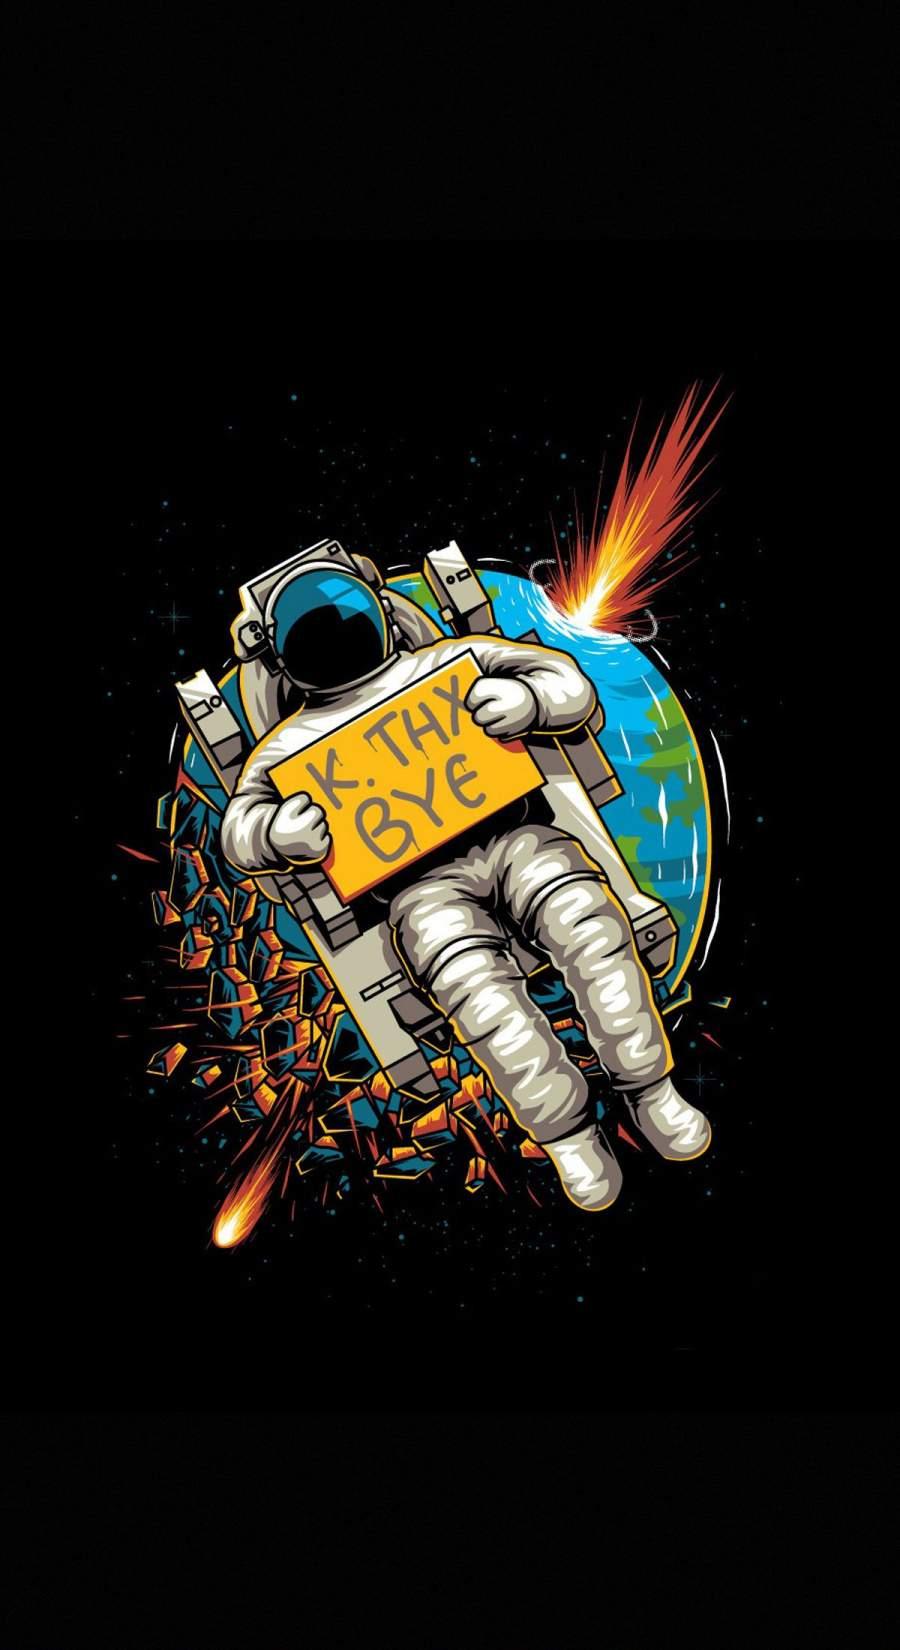 Goodbye Astronaut iPhone Wallpaper